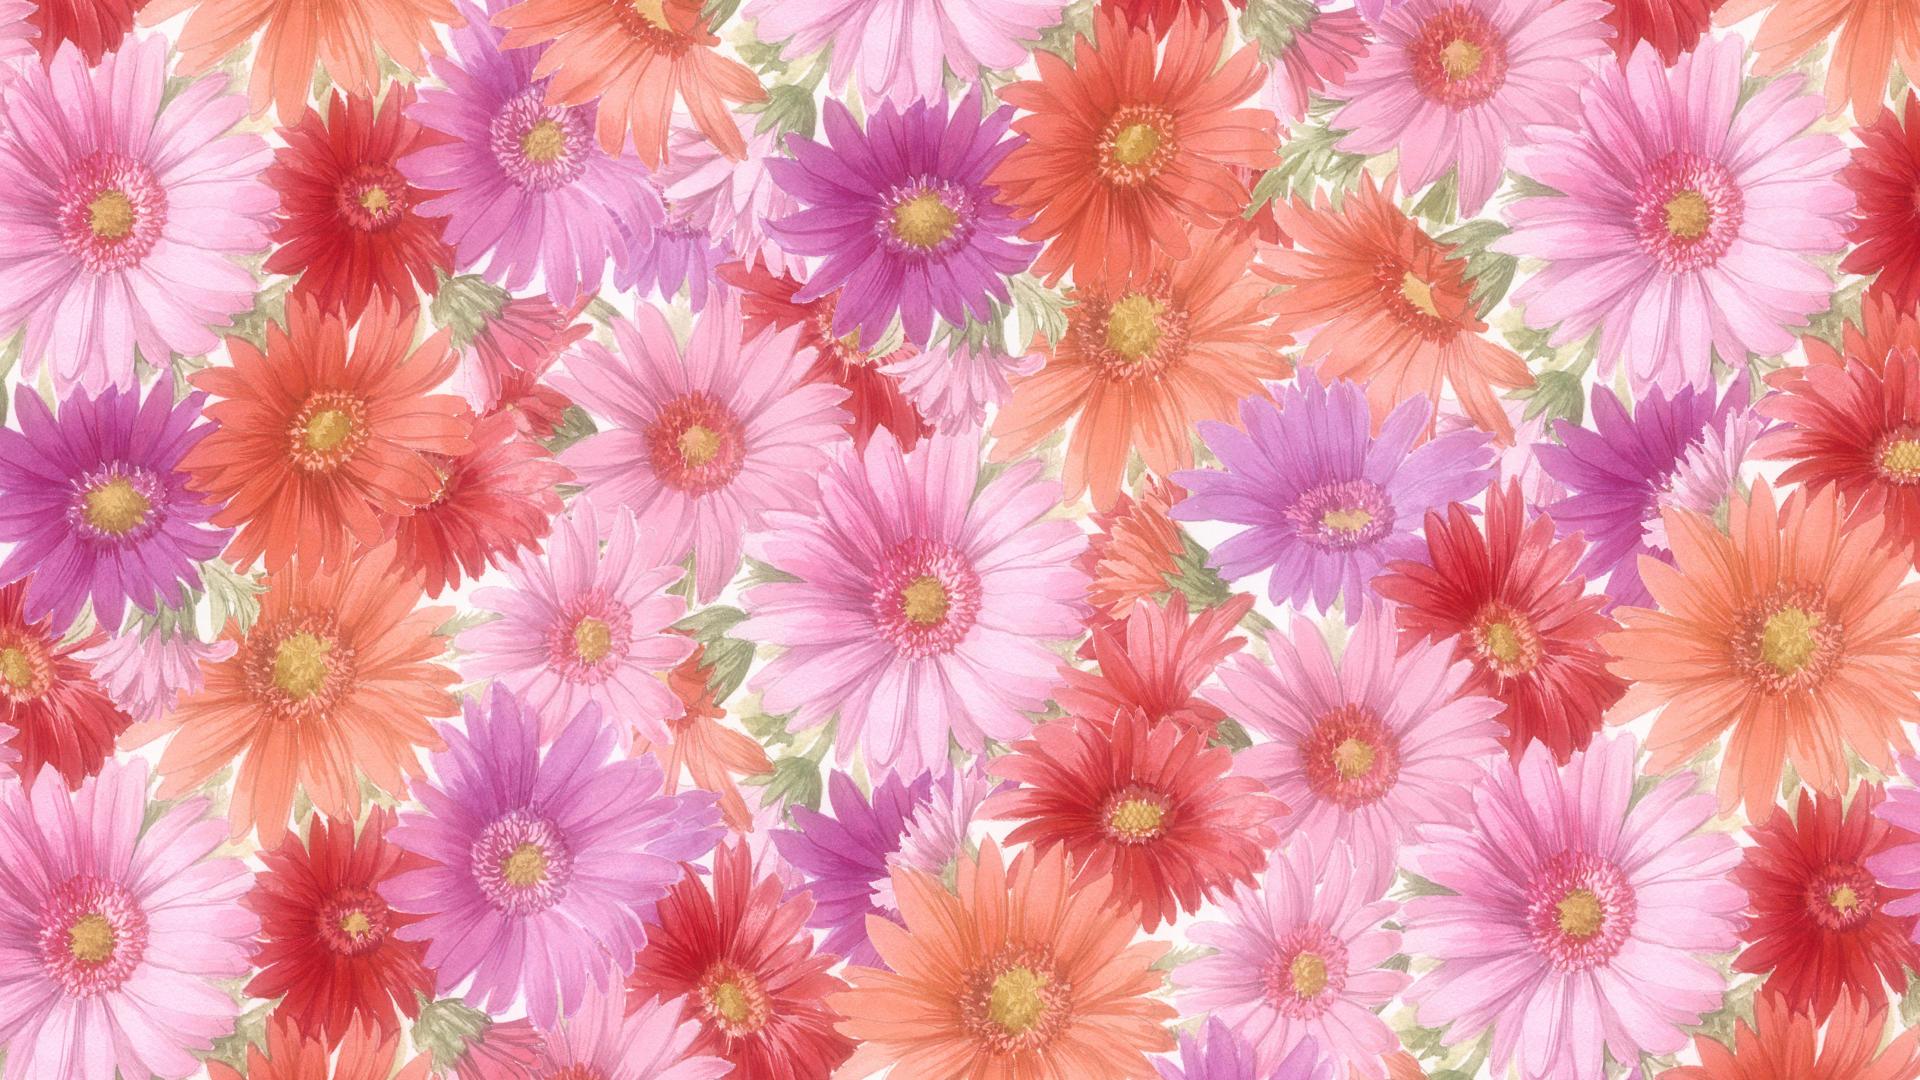 wallpaper yellow rose hd